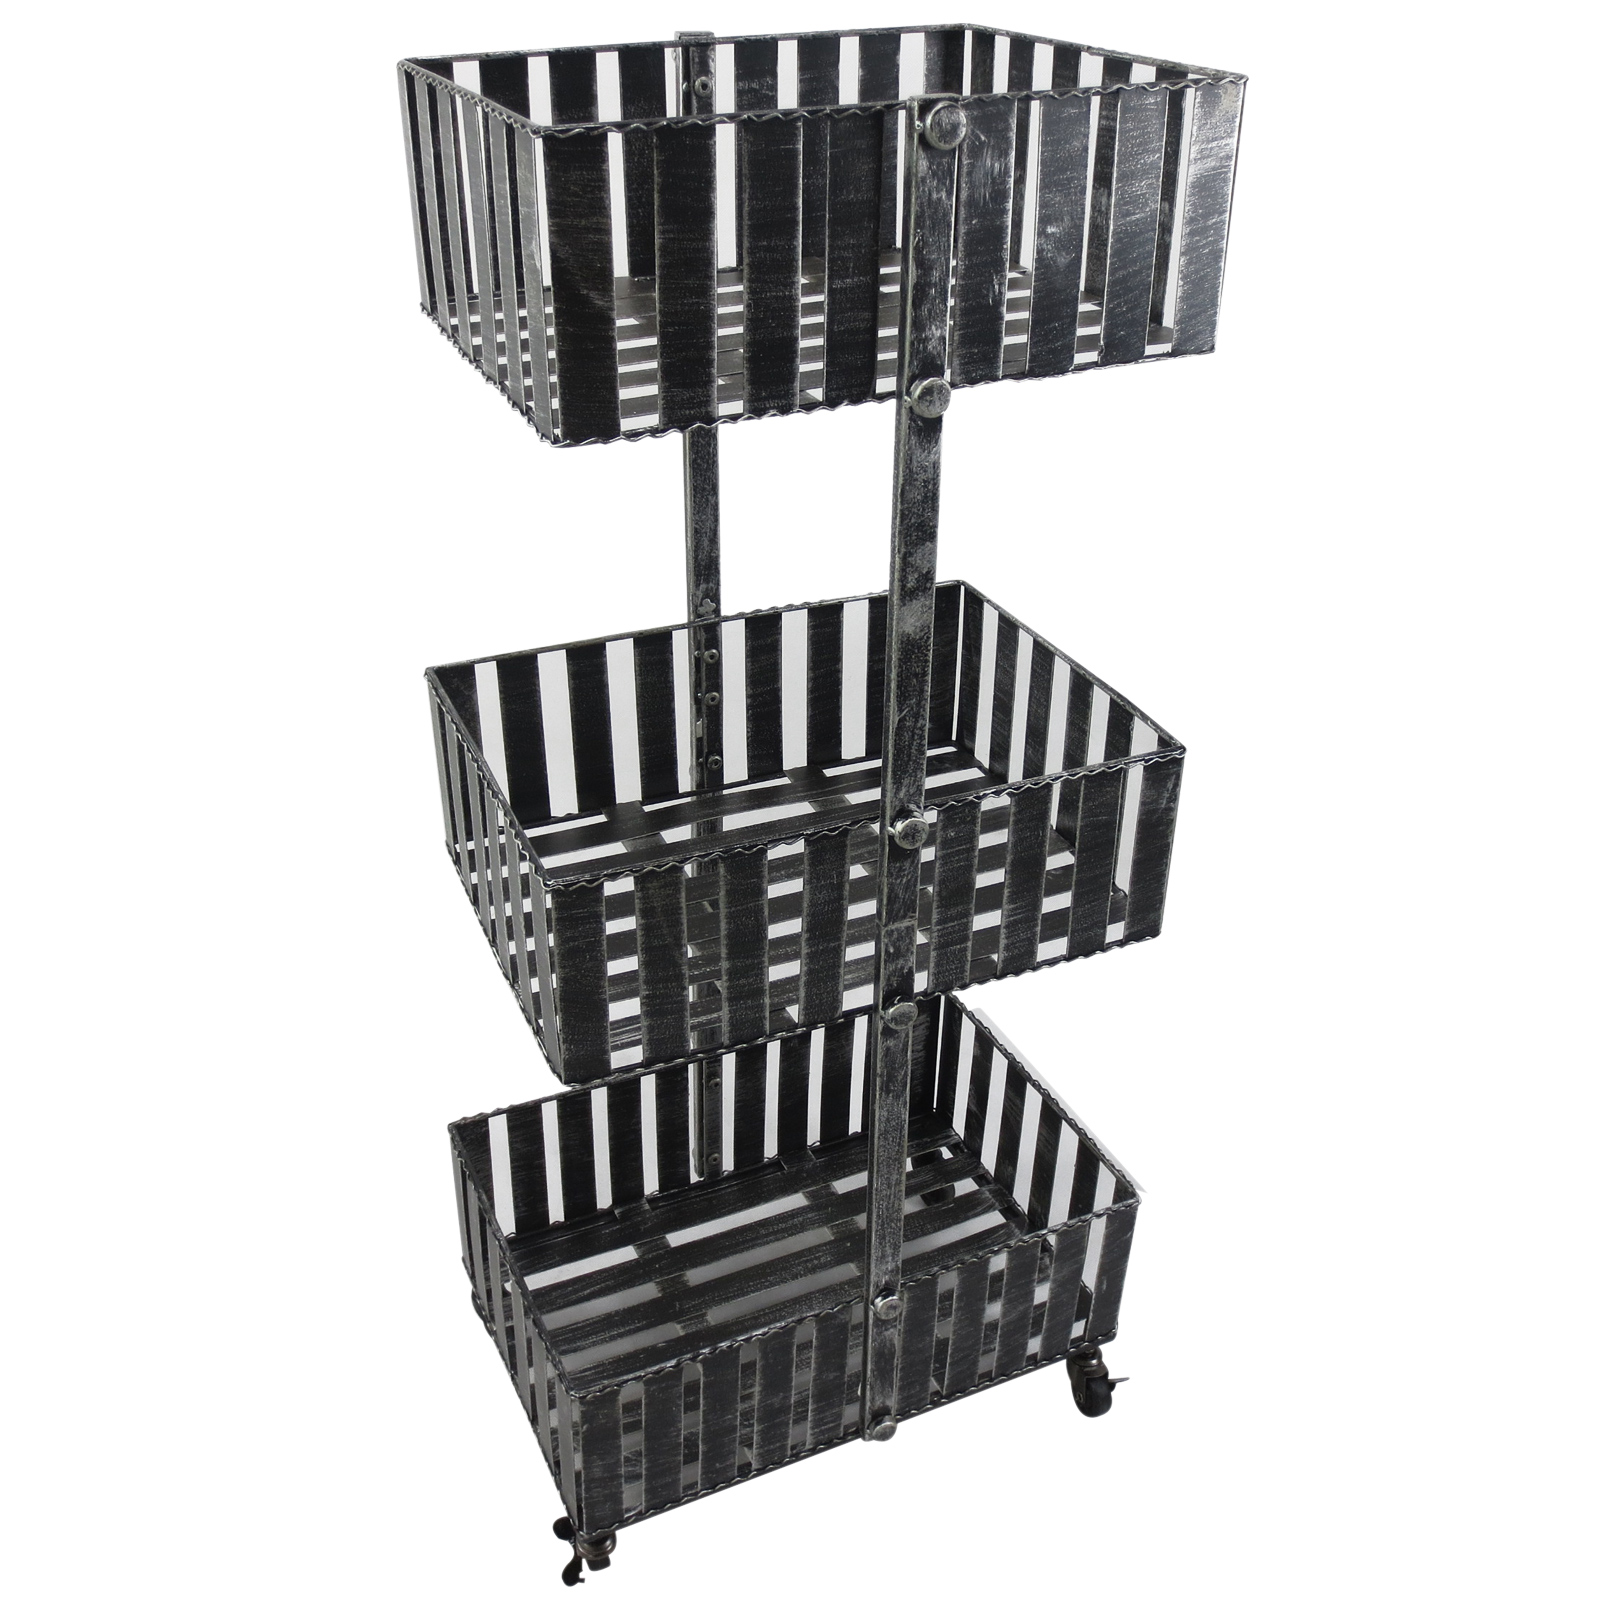 Outsunny Basket Planter 3 Shelves 4 Swivel Wheels (2 With Brake) Powder Coated Steel Frame Silver 10 Kg/for